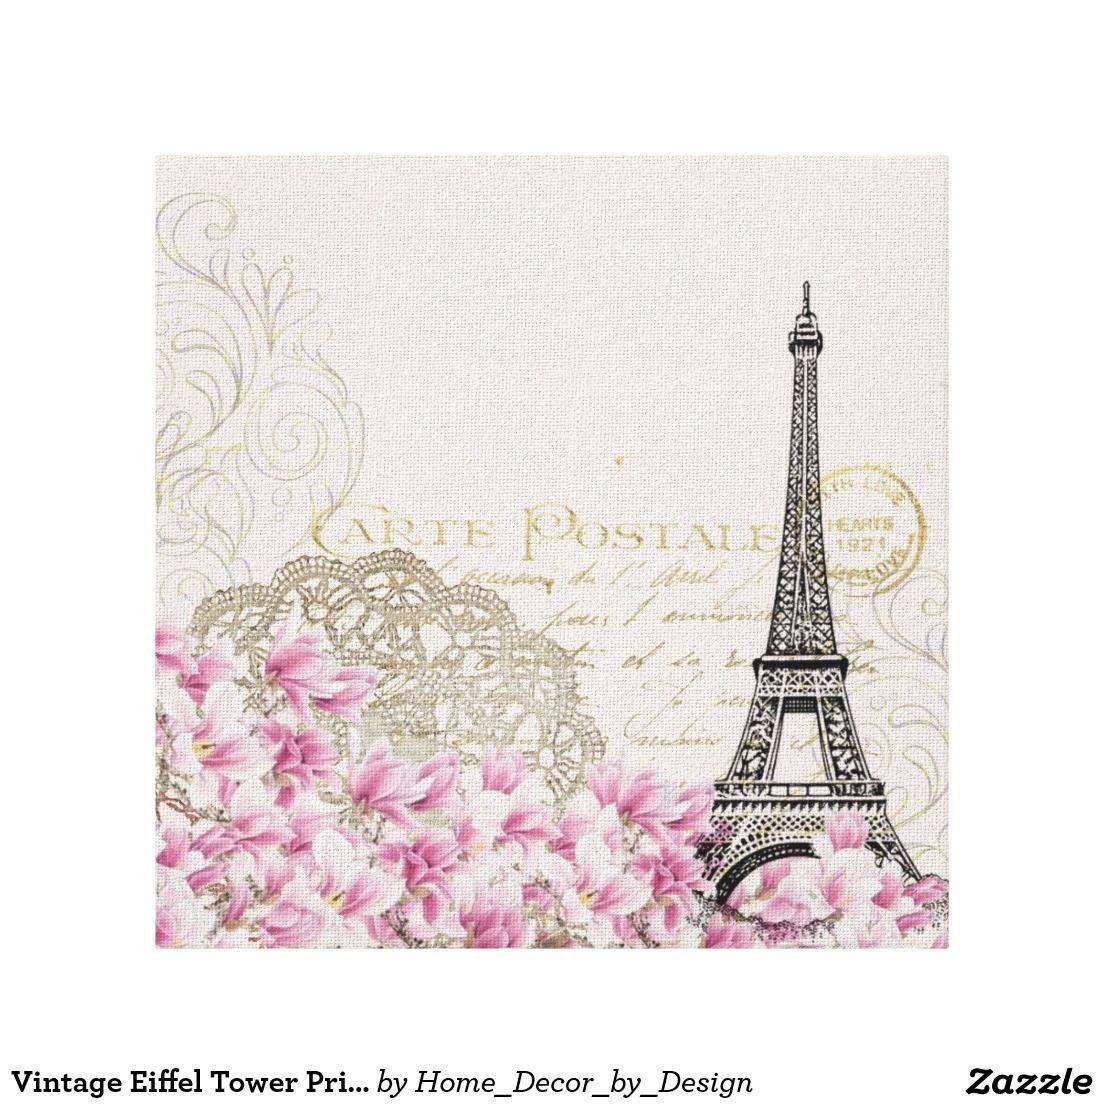 Vintage Eiffel Tower Print